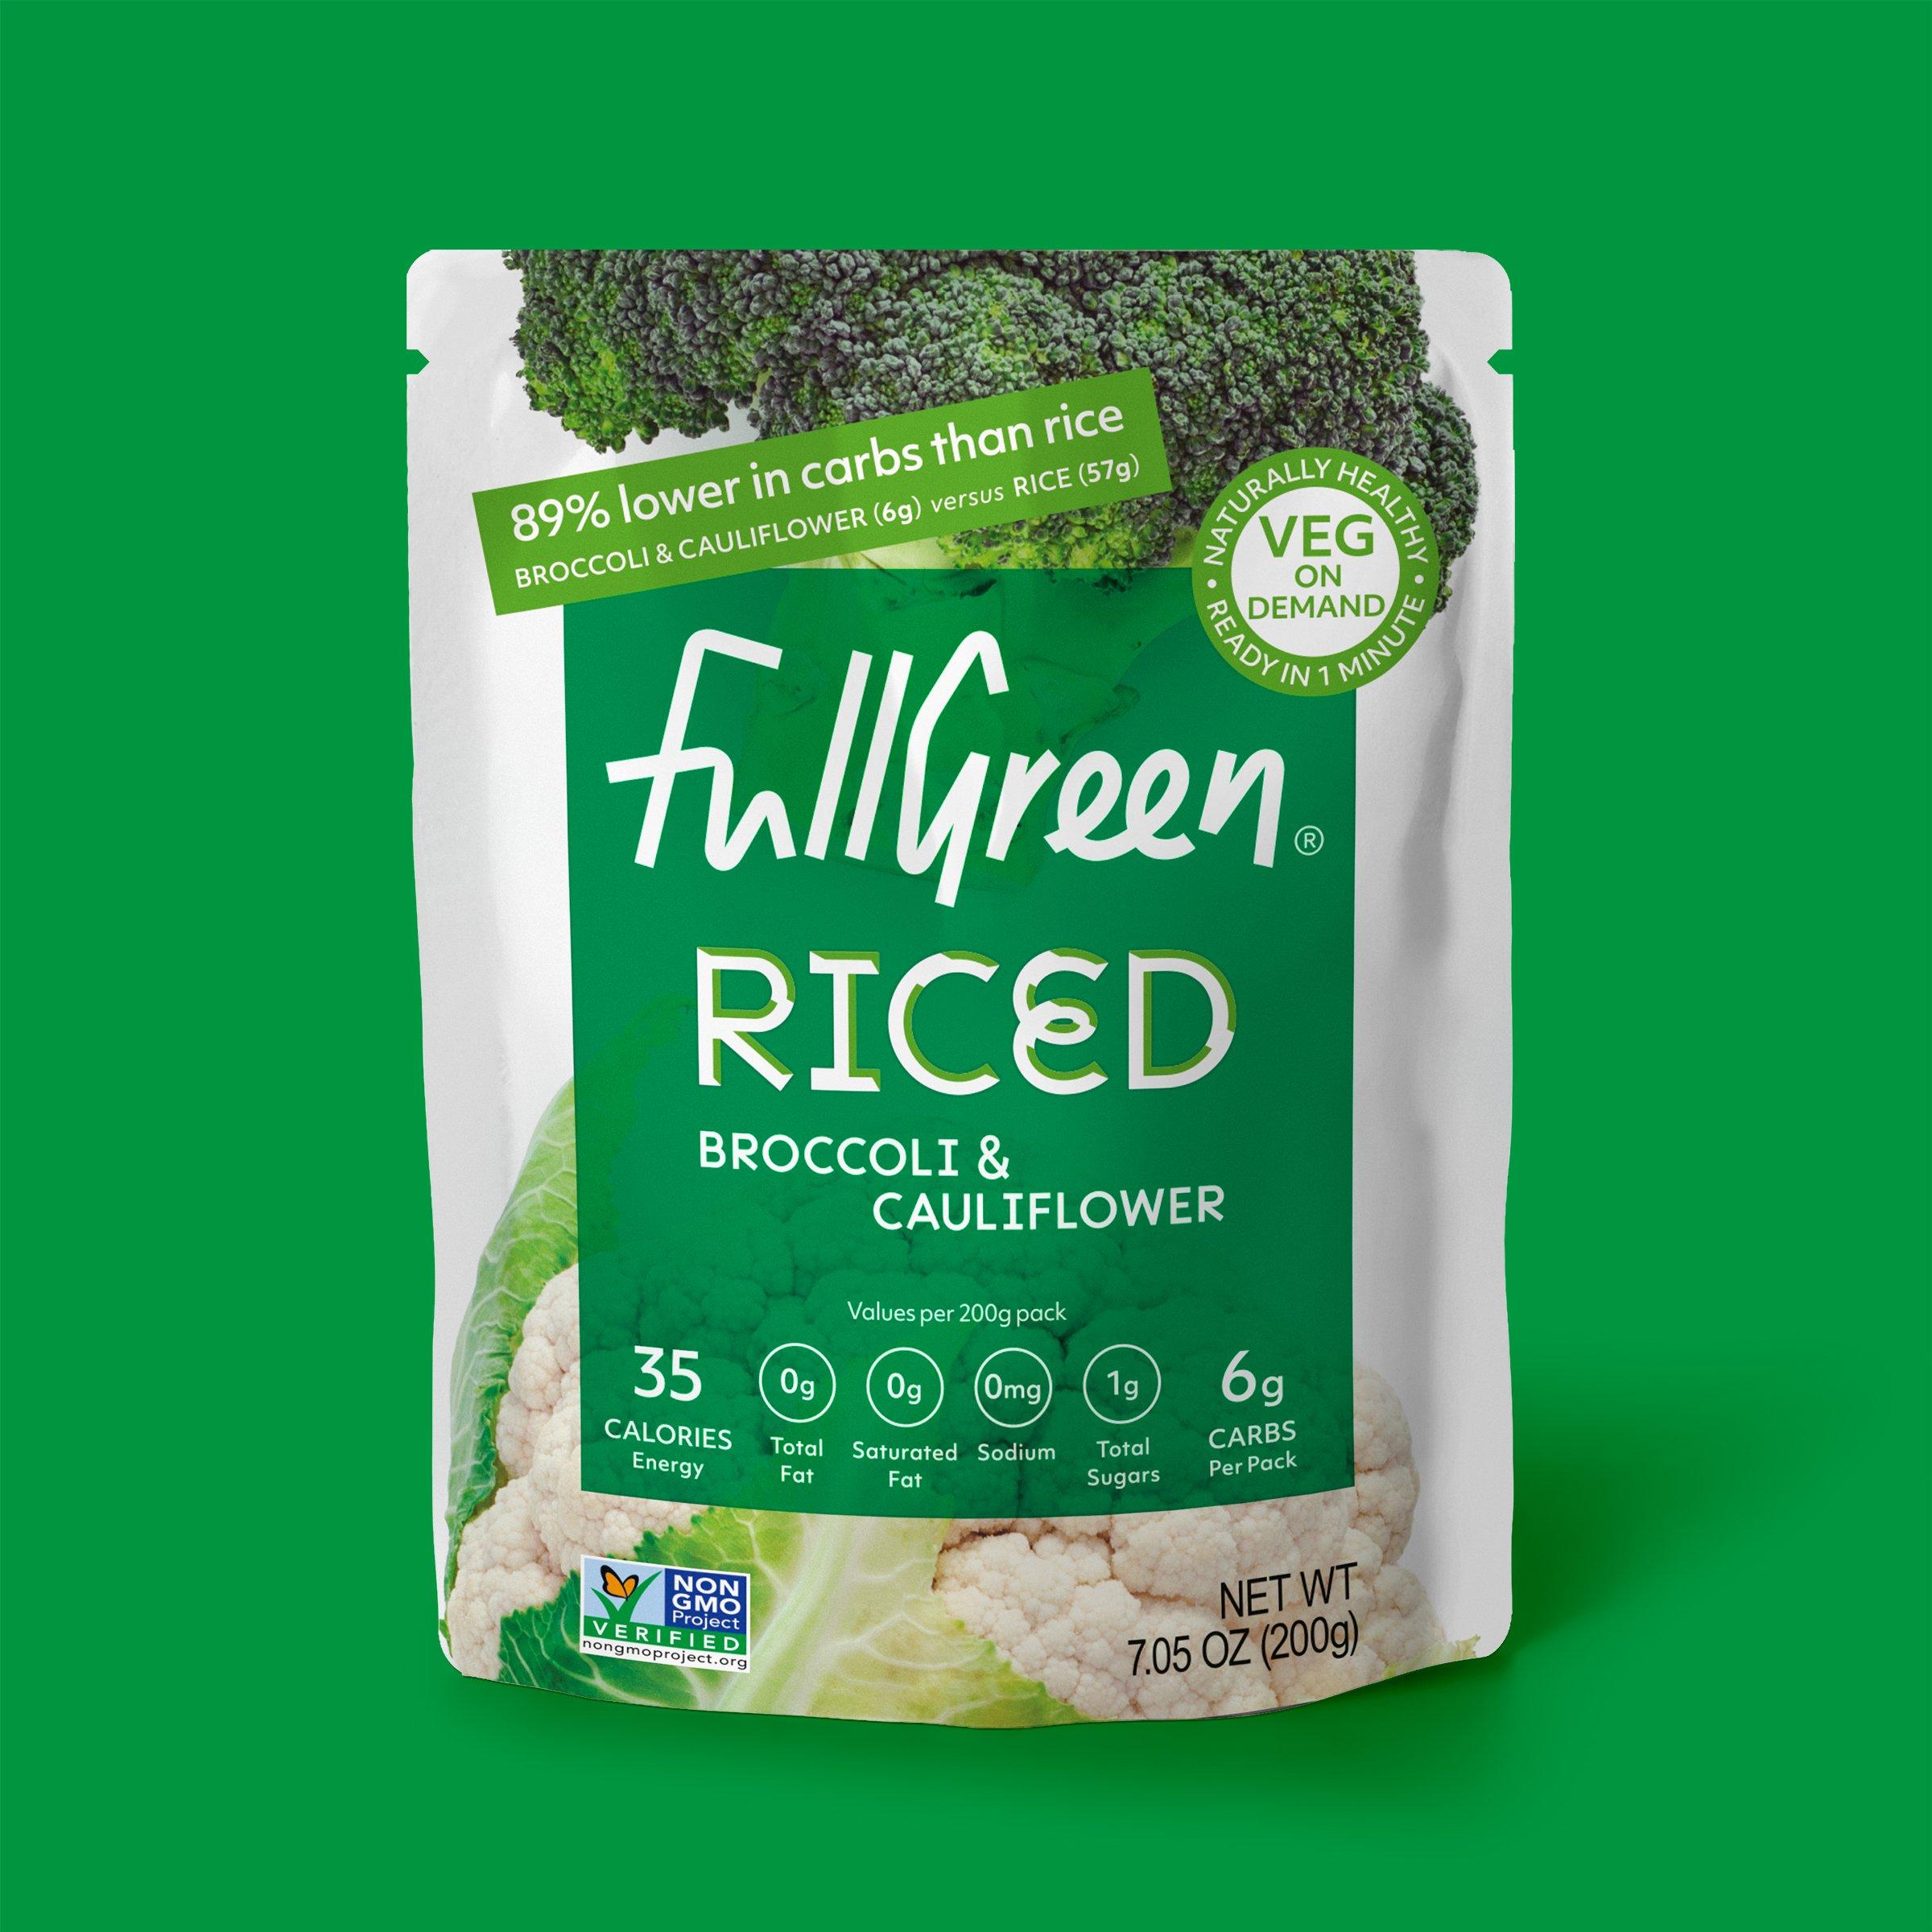 Riced Broccoli & Cauliflower 200g